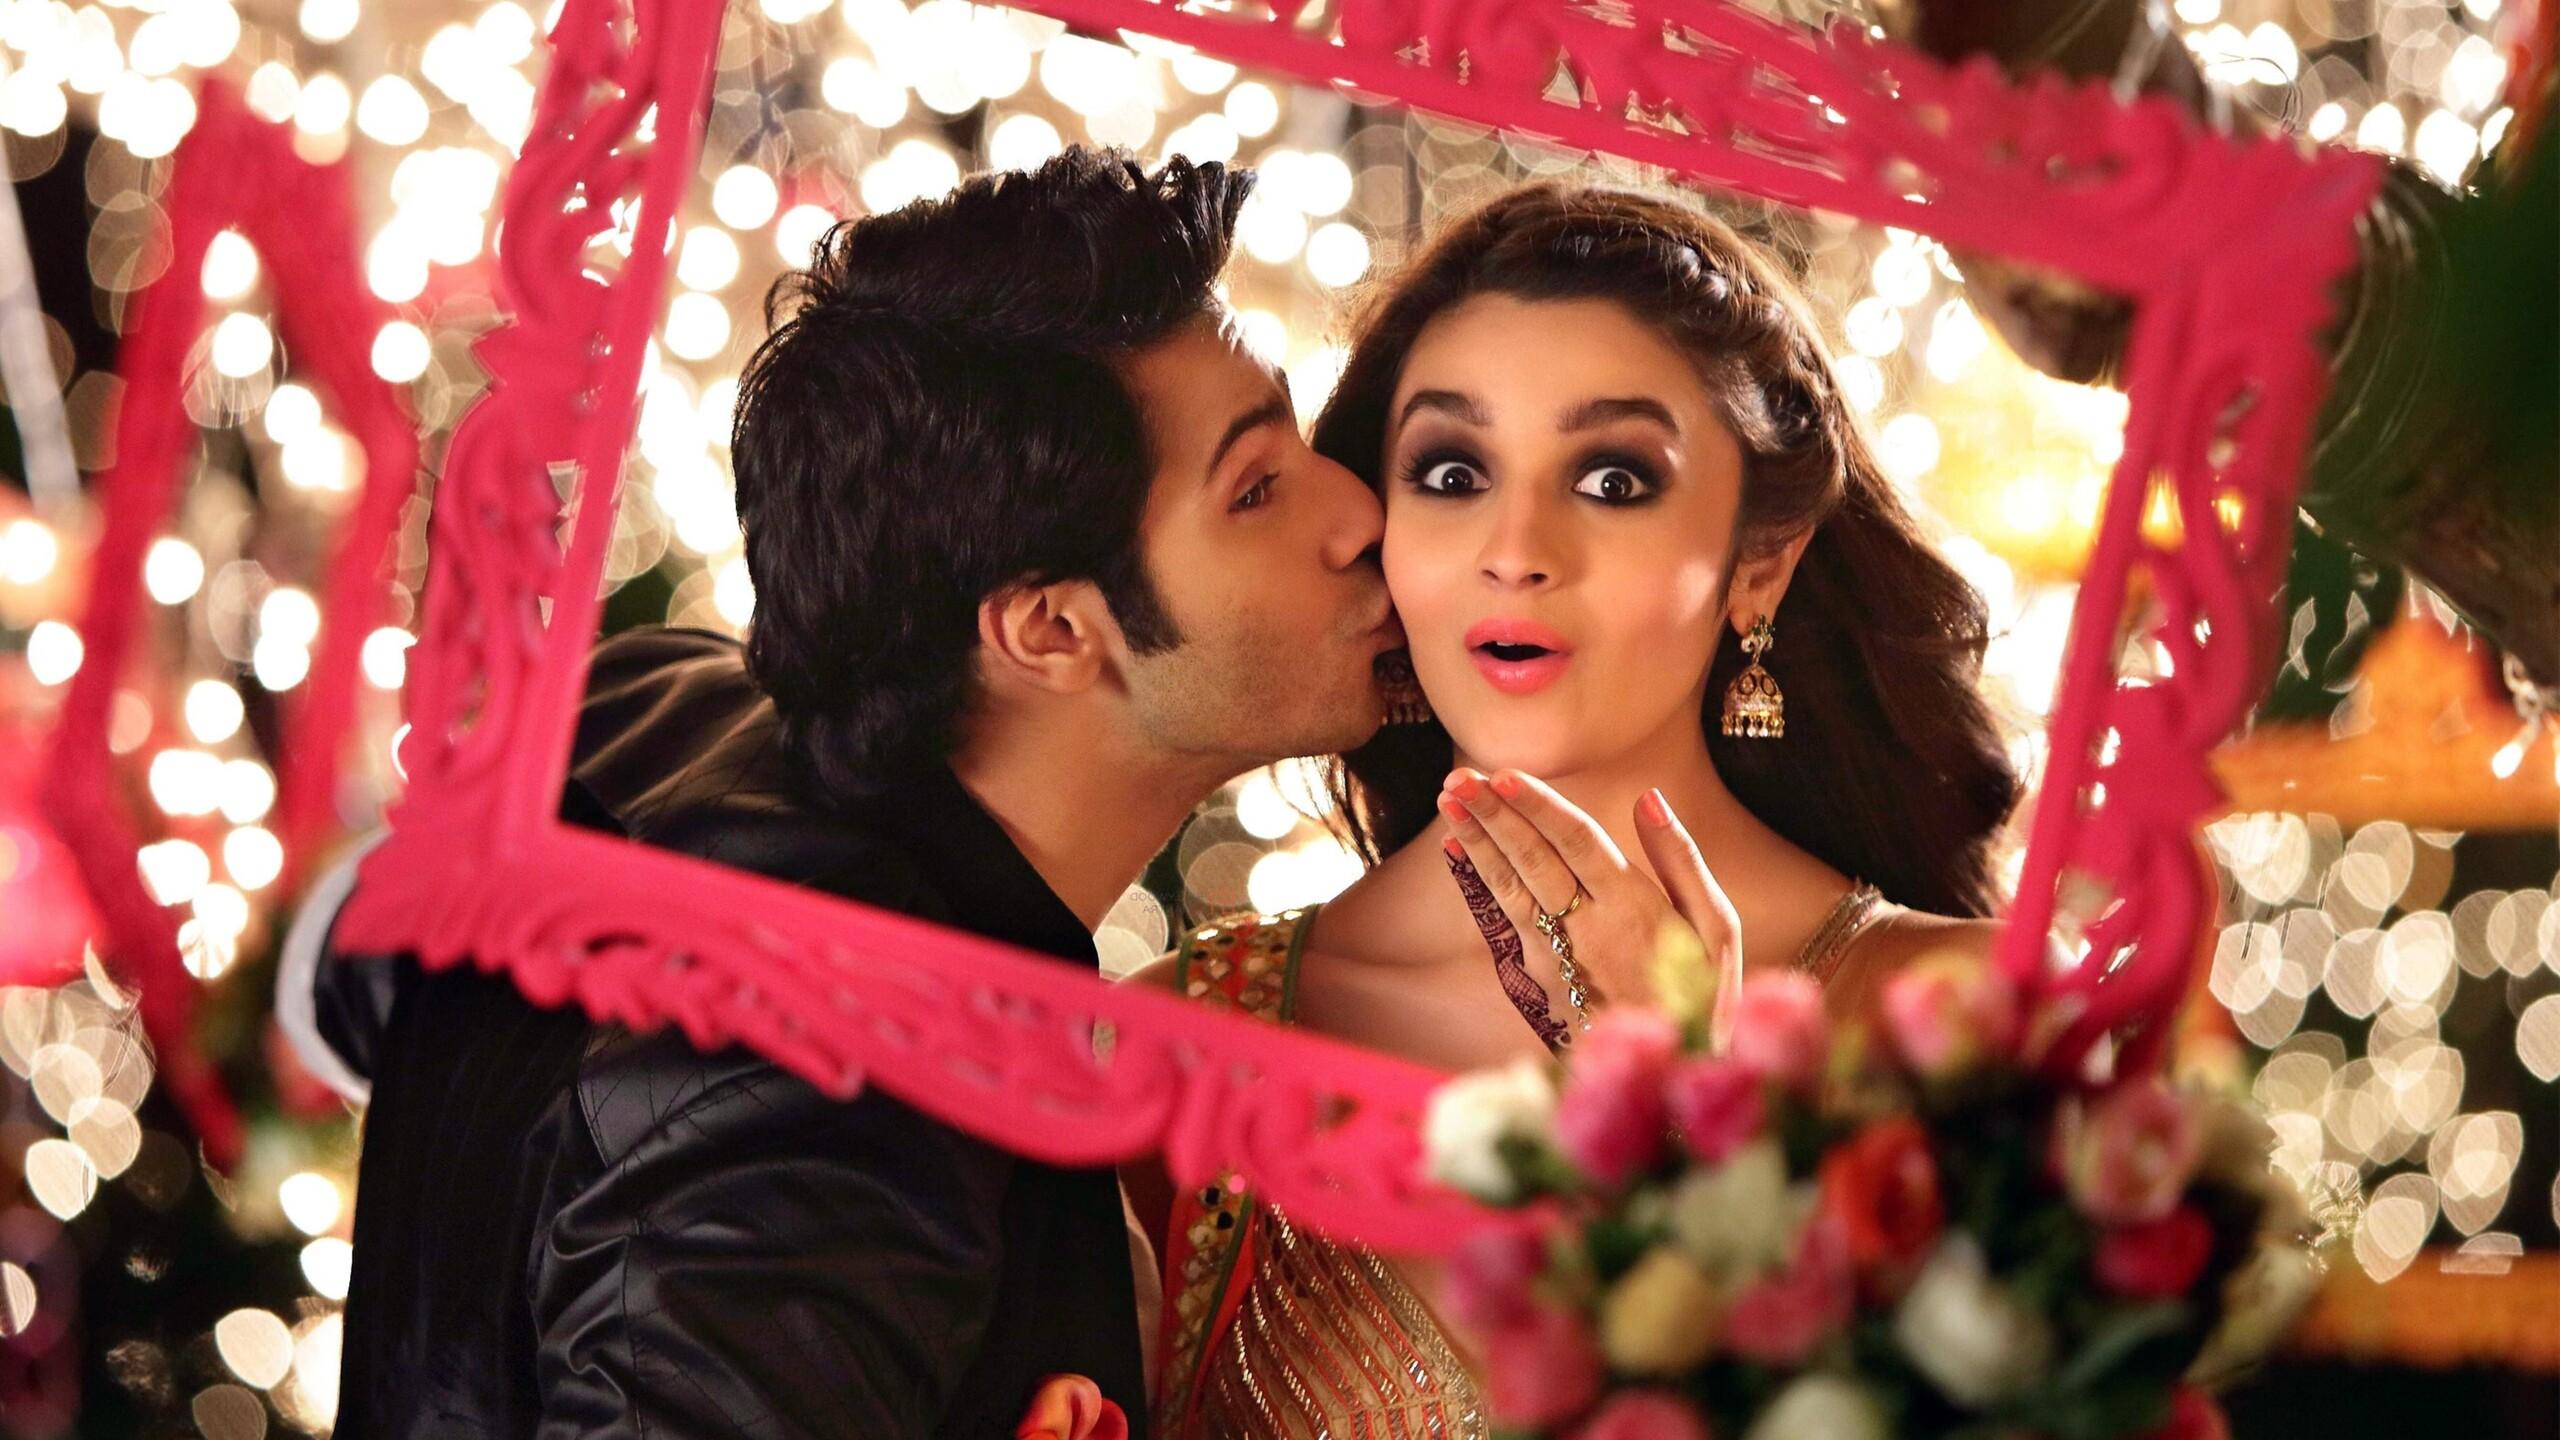 2560x1440 Alia Bhatt Kissing Varun Dhawan 1440p Resolution Hd 4k